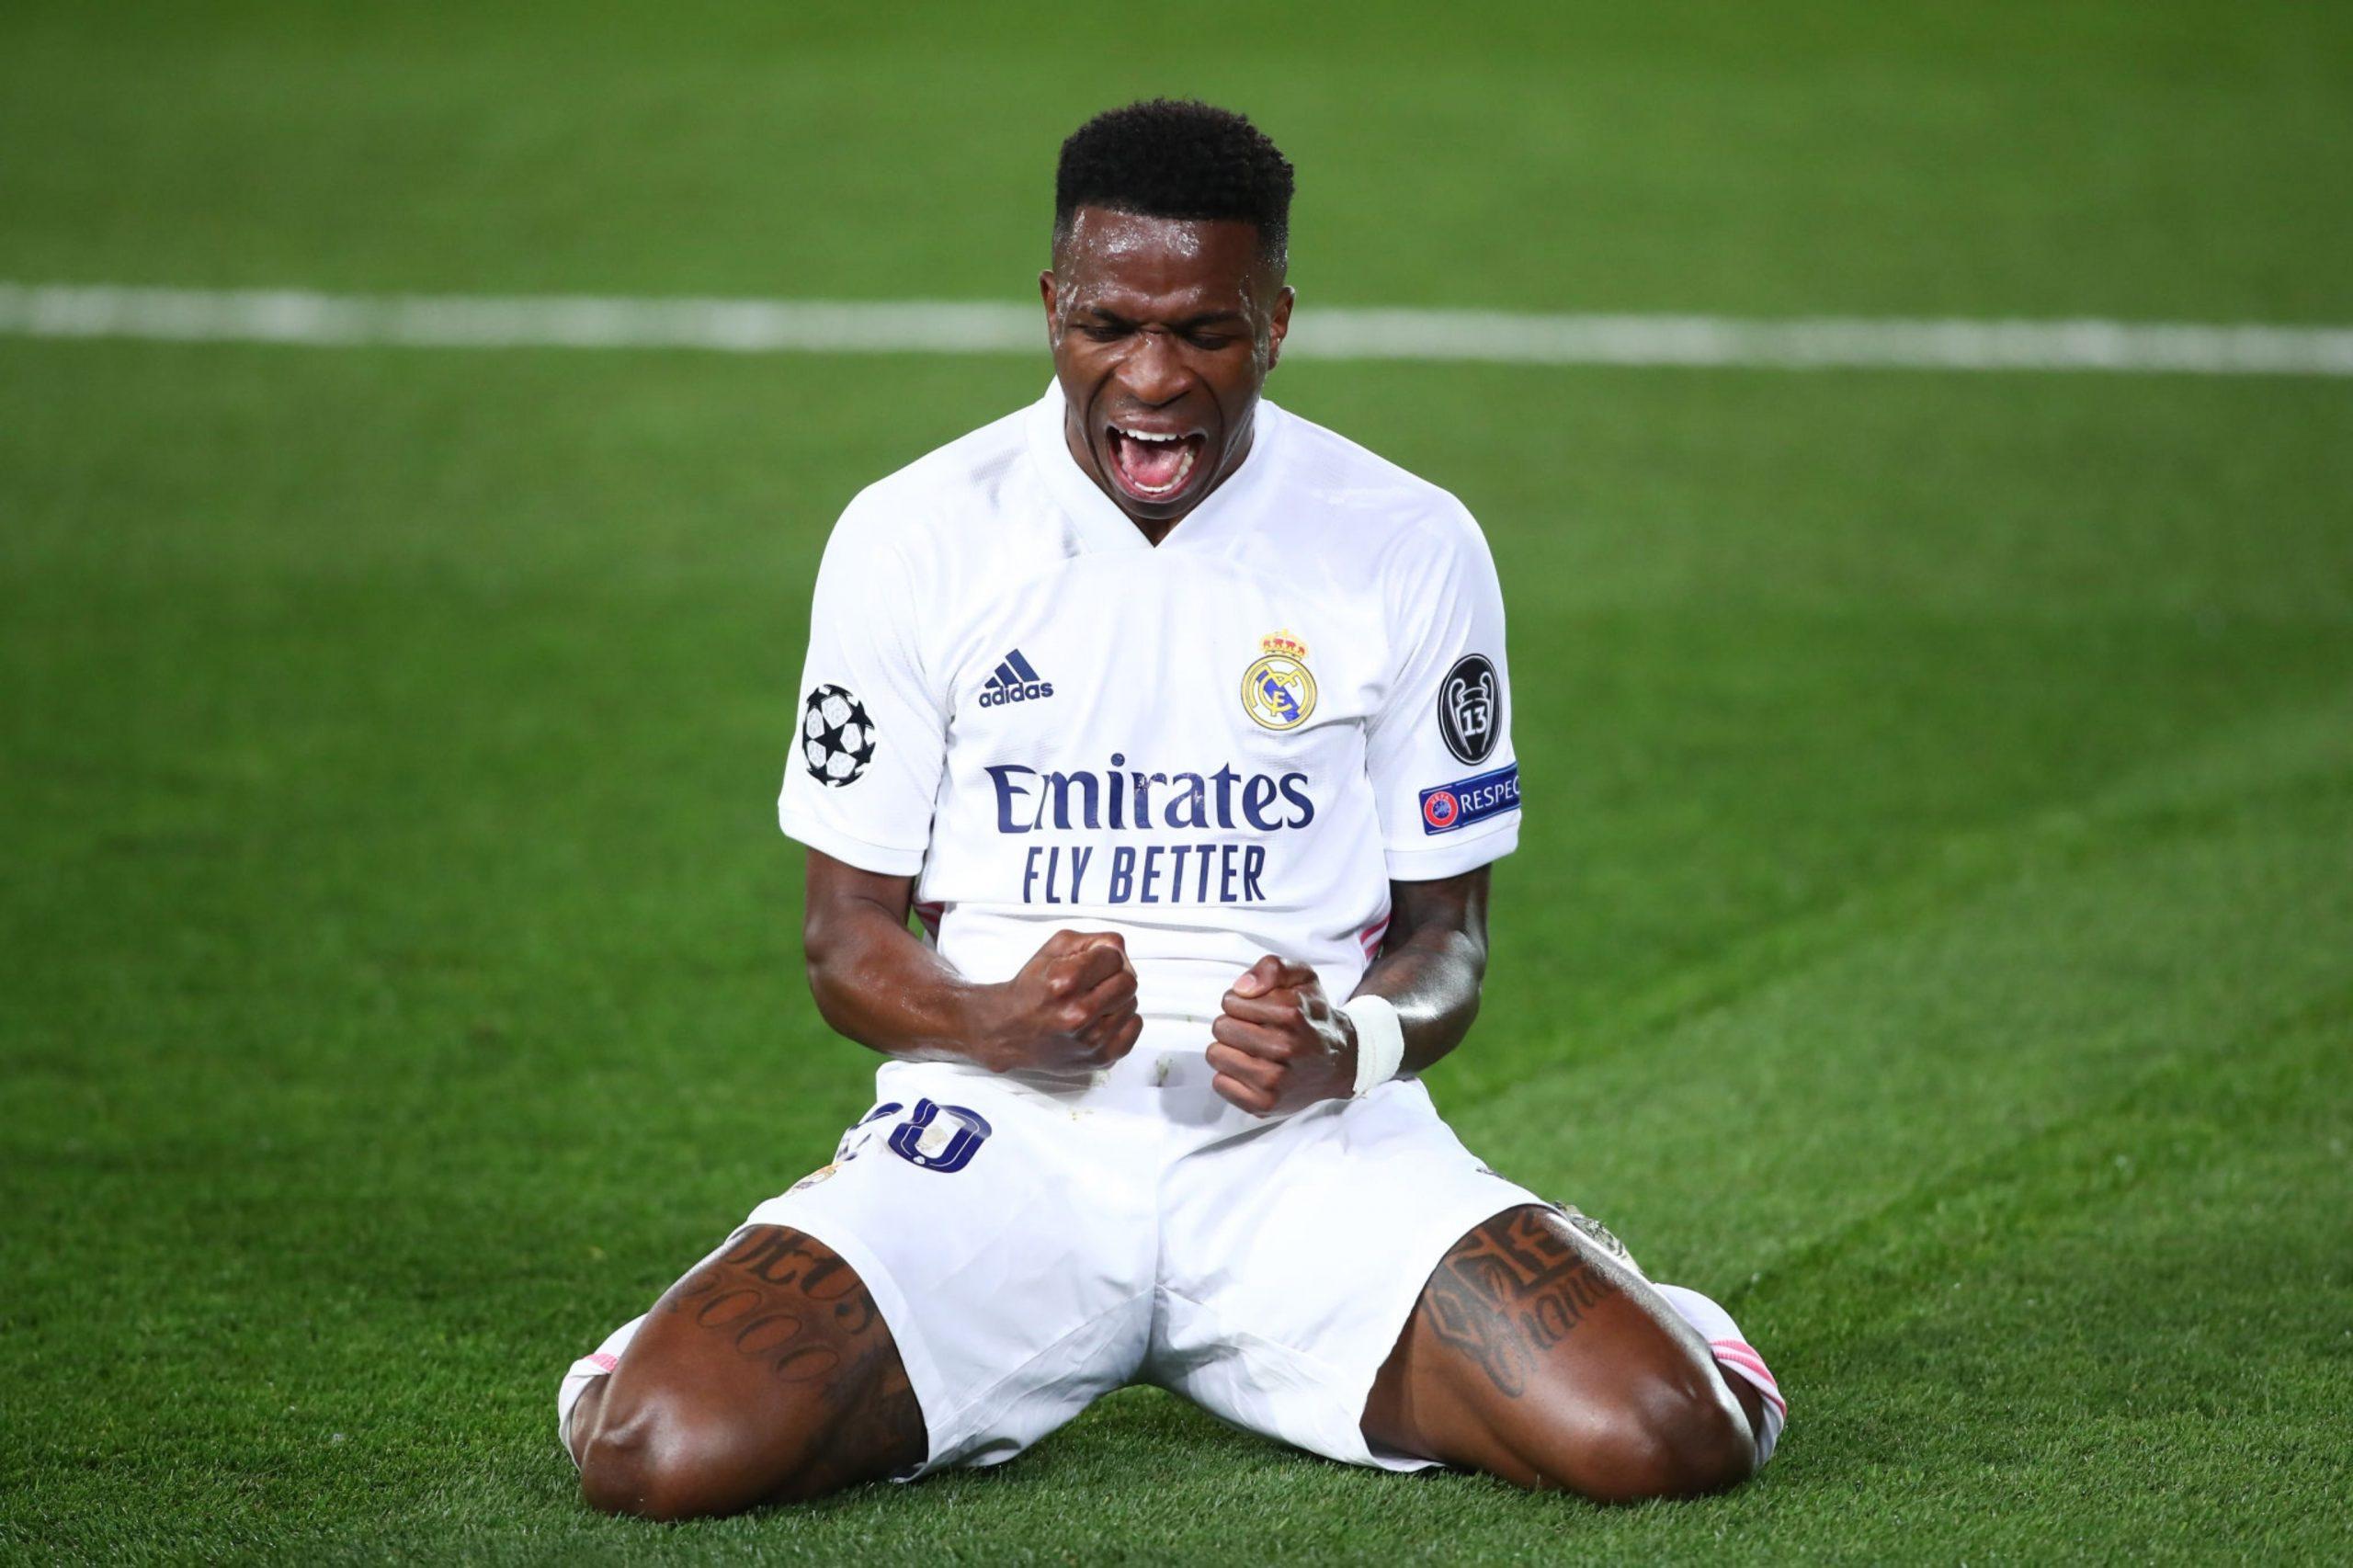 Real Madrid tiene al borde del nocaut al Liverpool